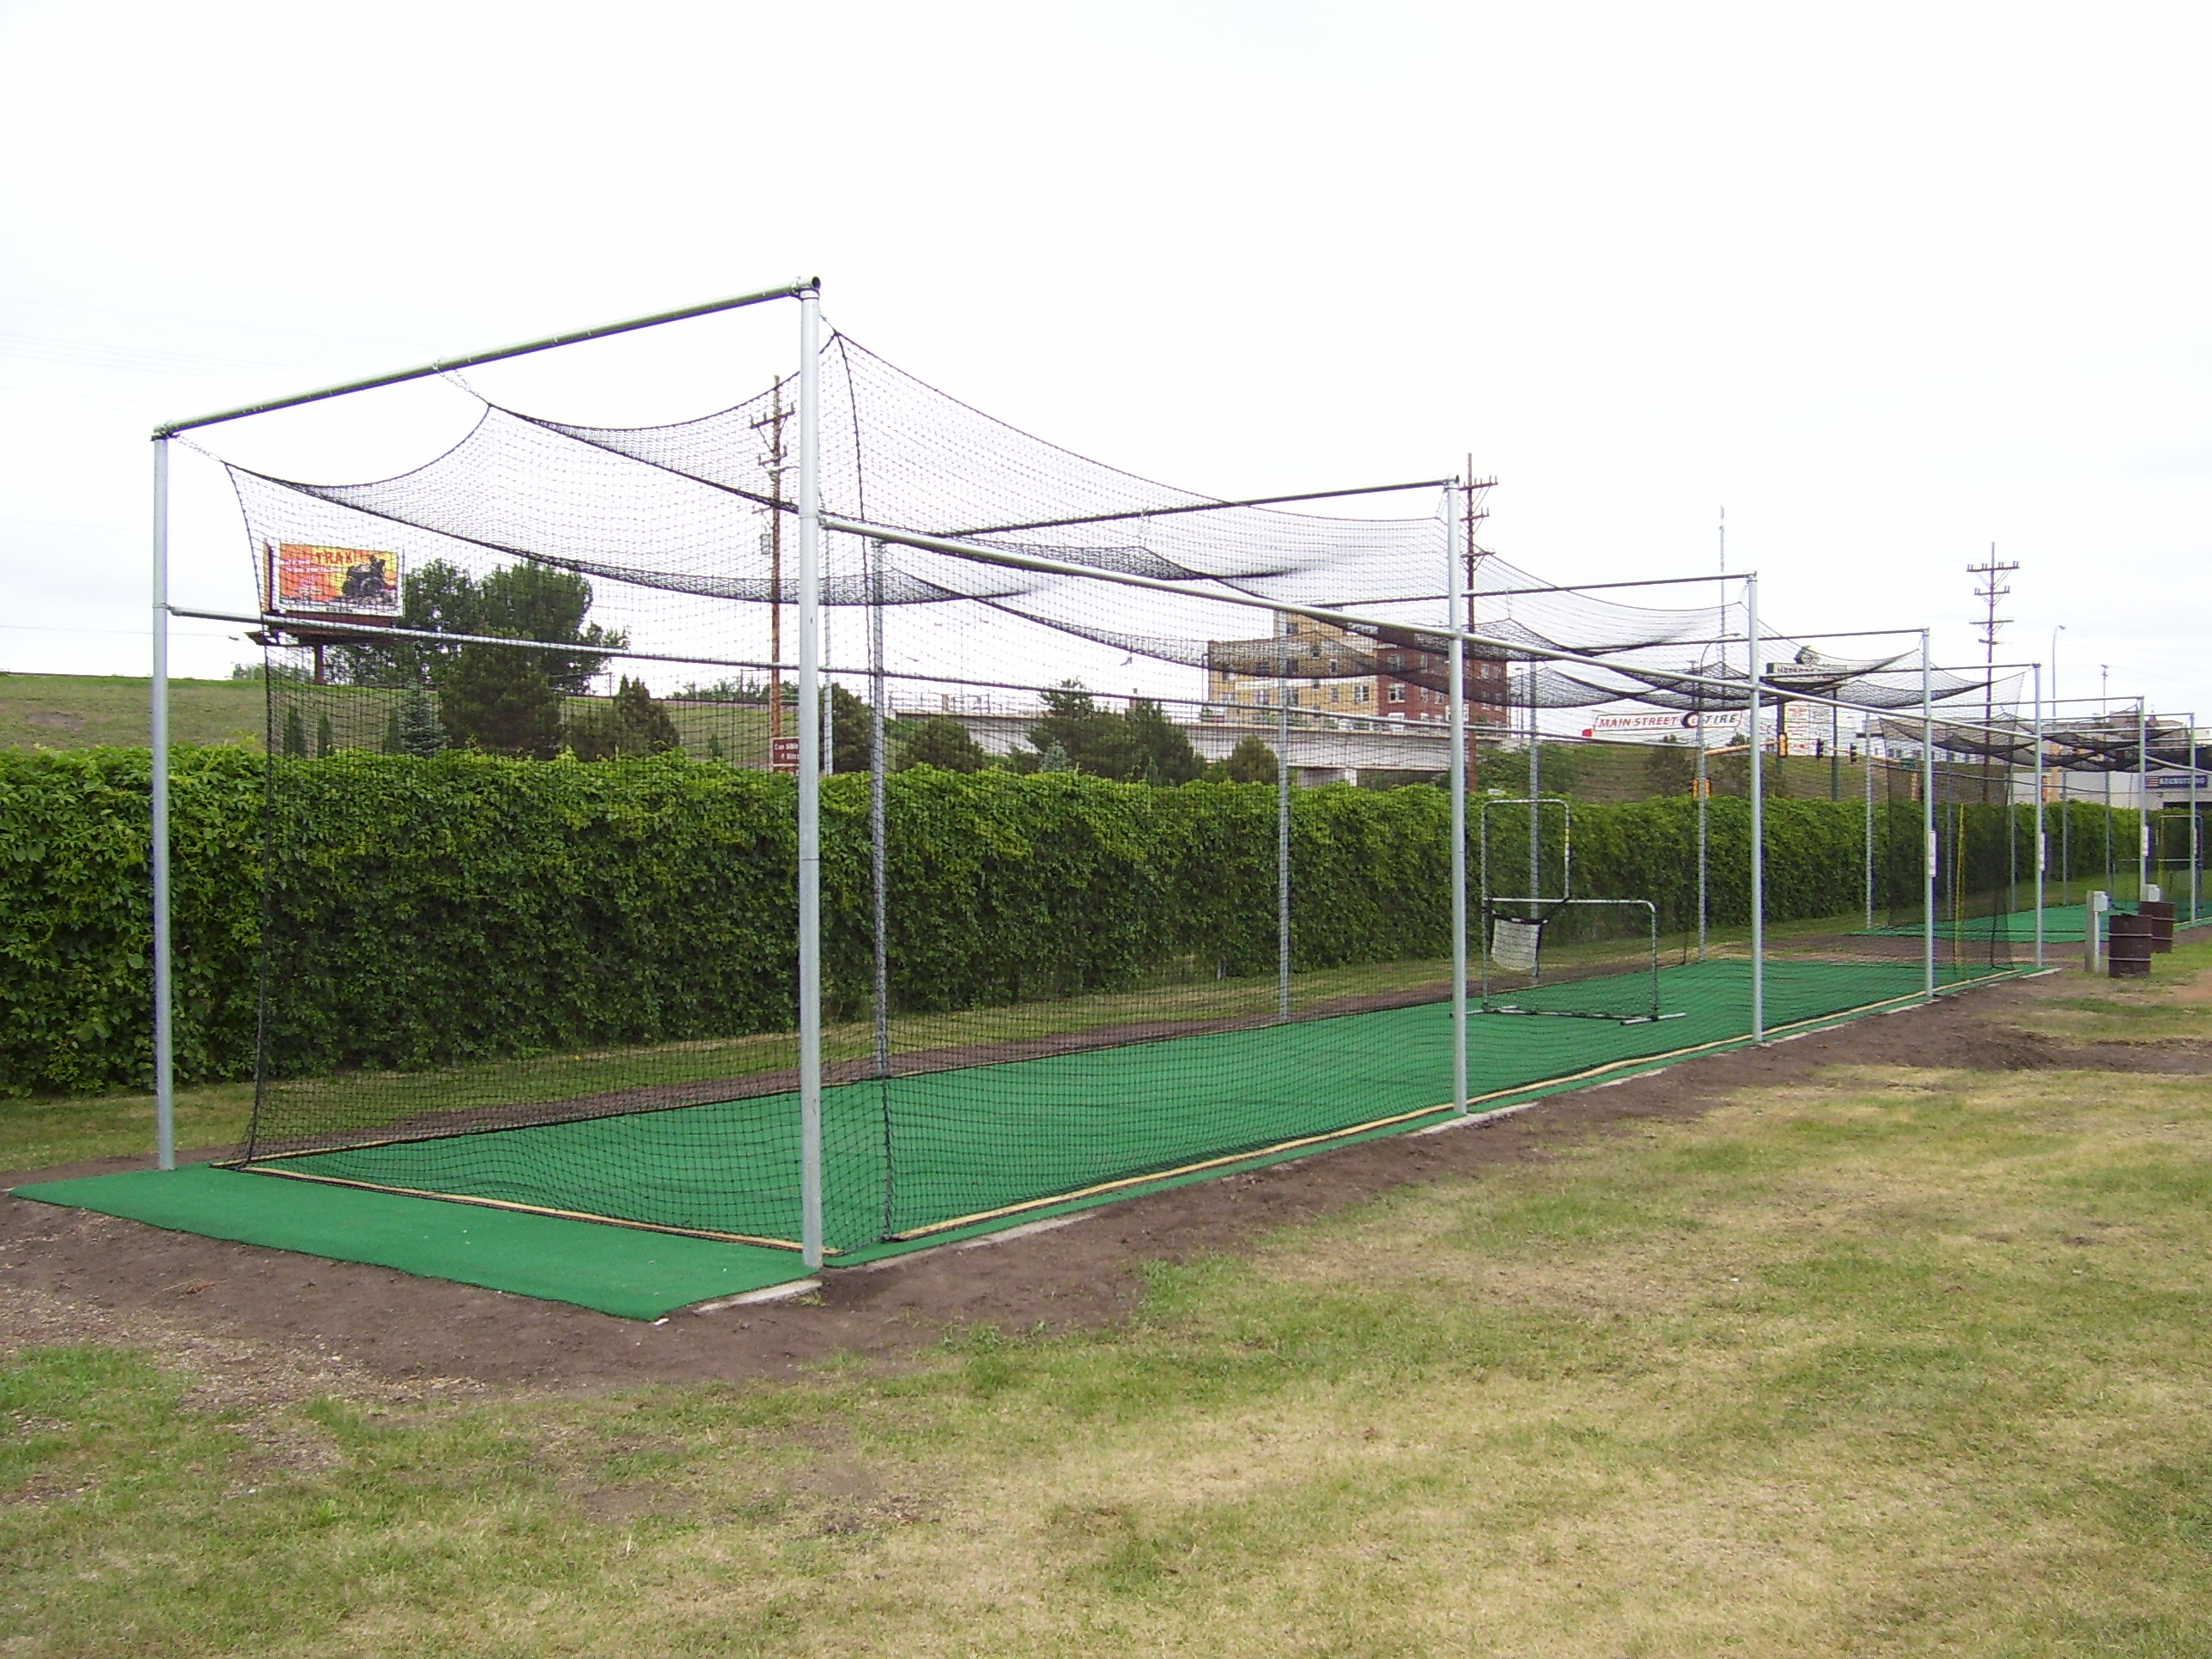 used batting cage batting cage